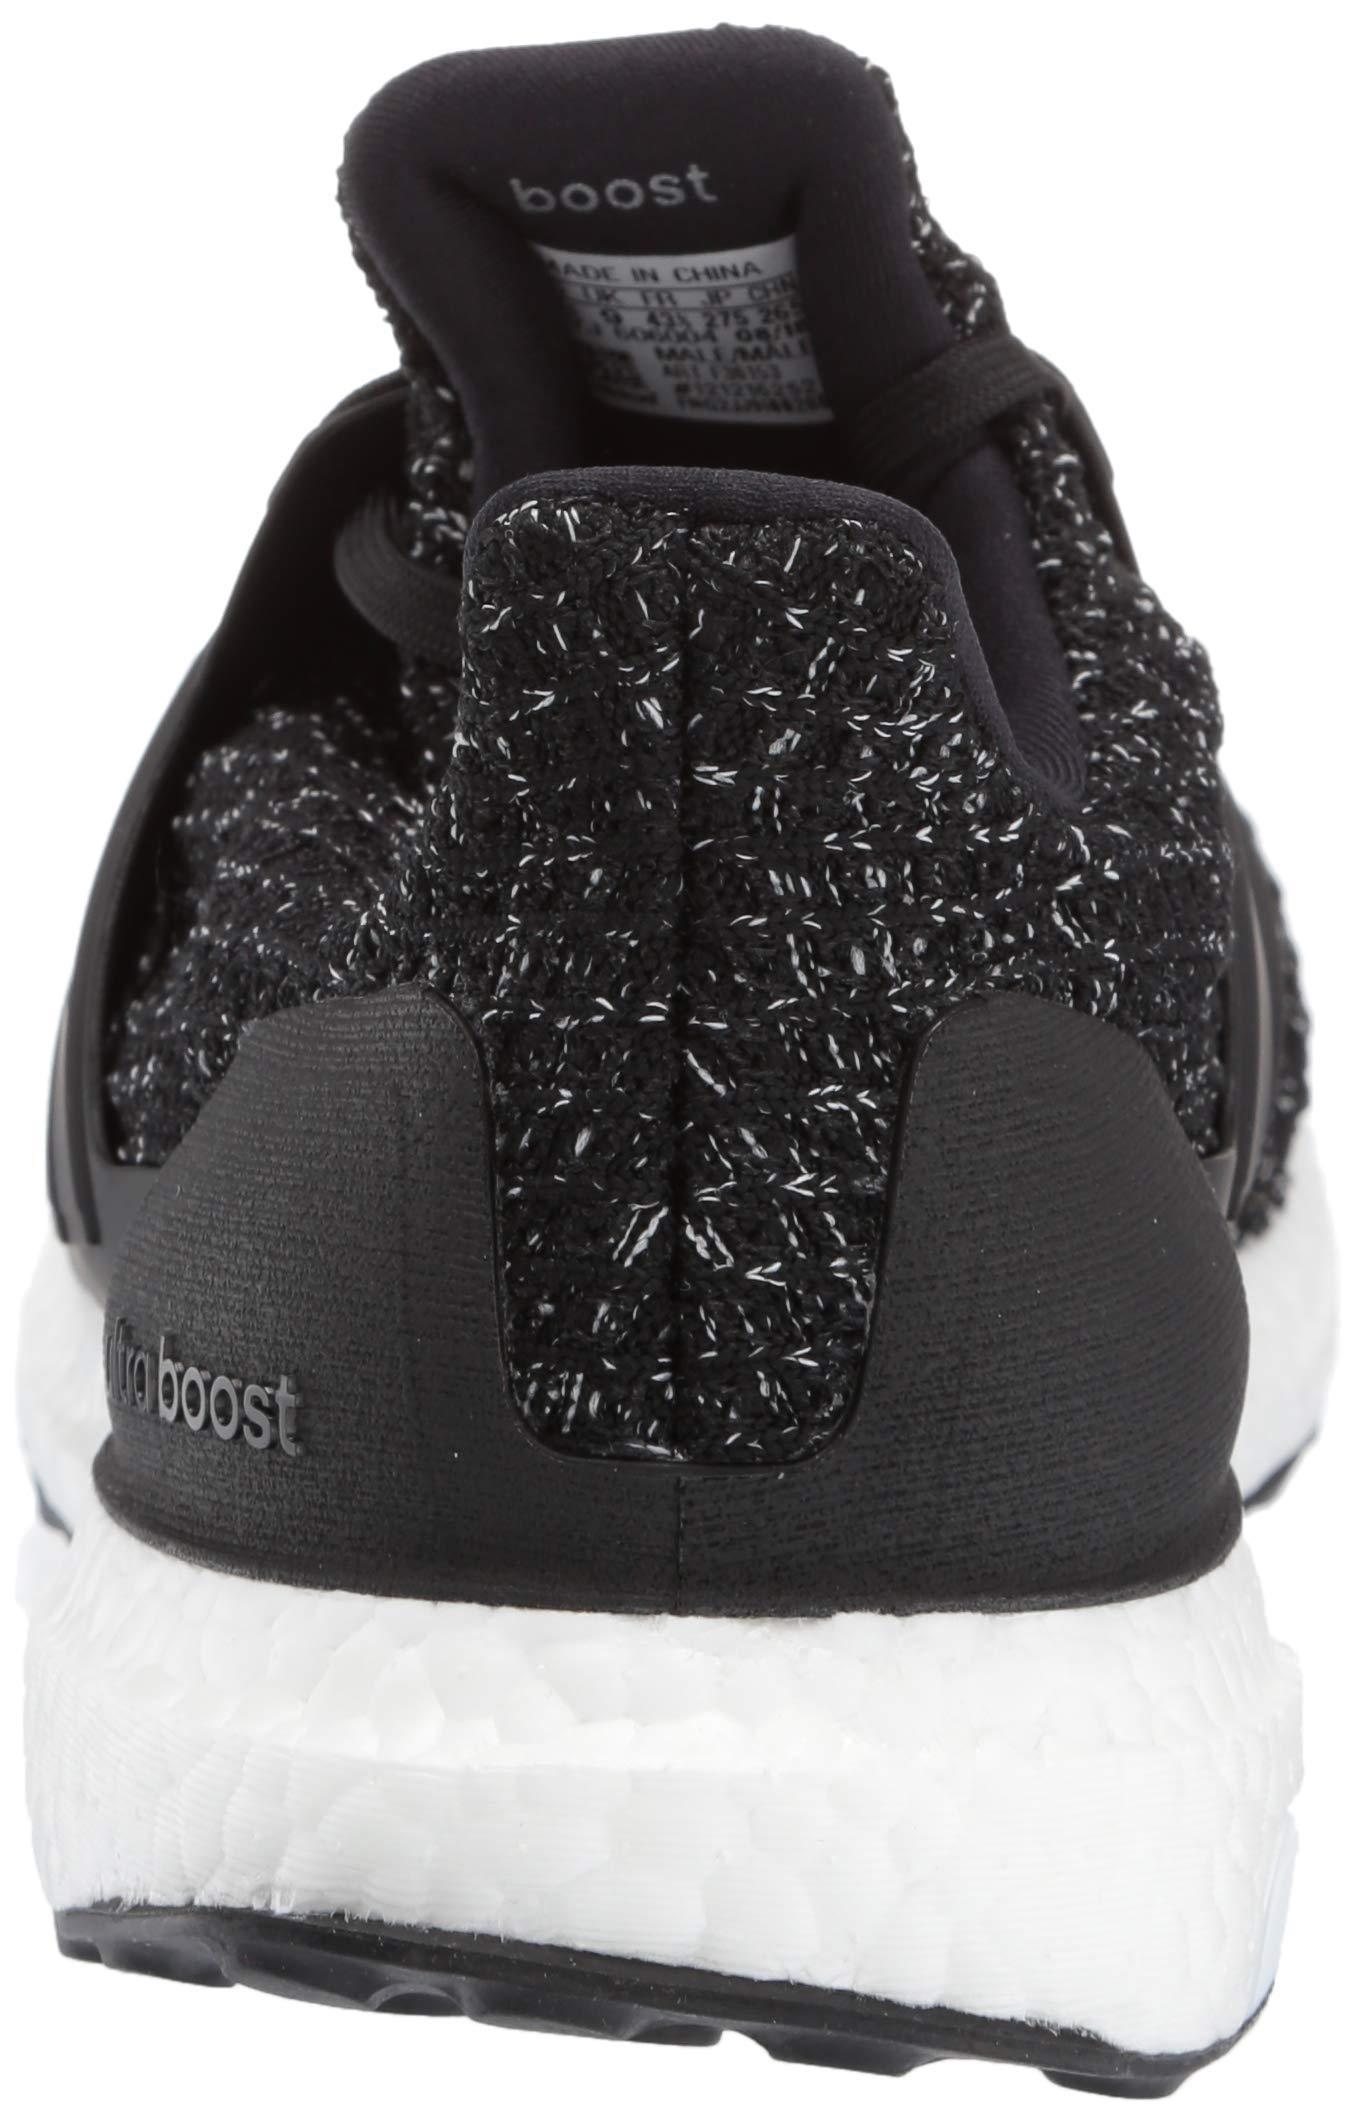 adidas Men's Ultraboost, Black/White, 9 M US by adidas (Image #2)